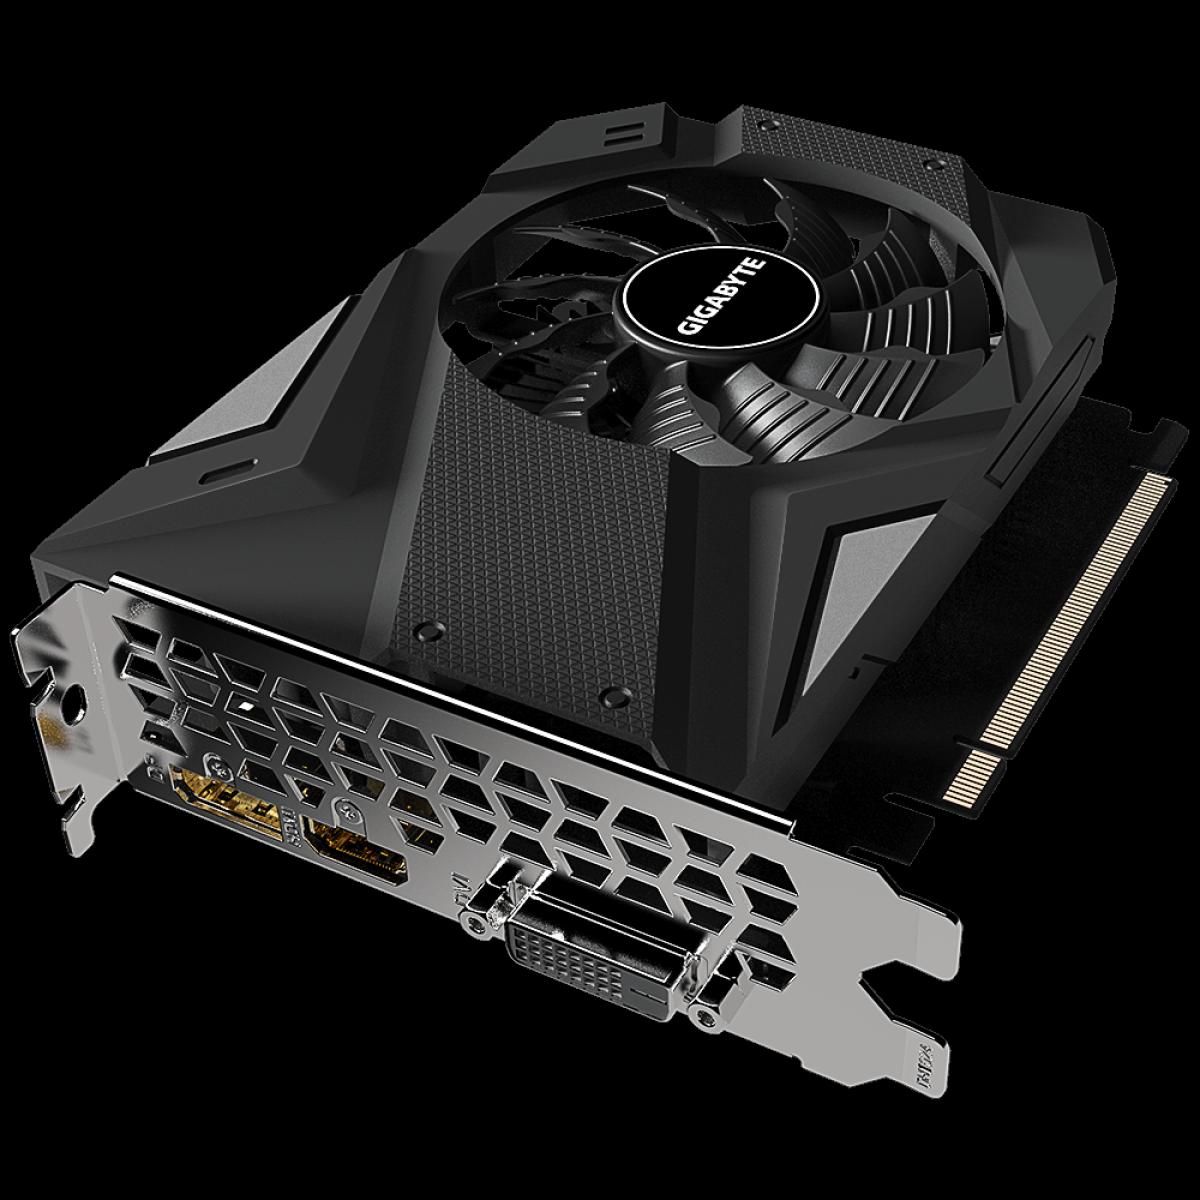 Placa de Vídeo Gigabyte GeForce GTX 1650 D6 OC, 4GB GDDR6, 128Bit